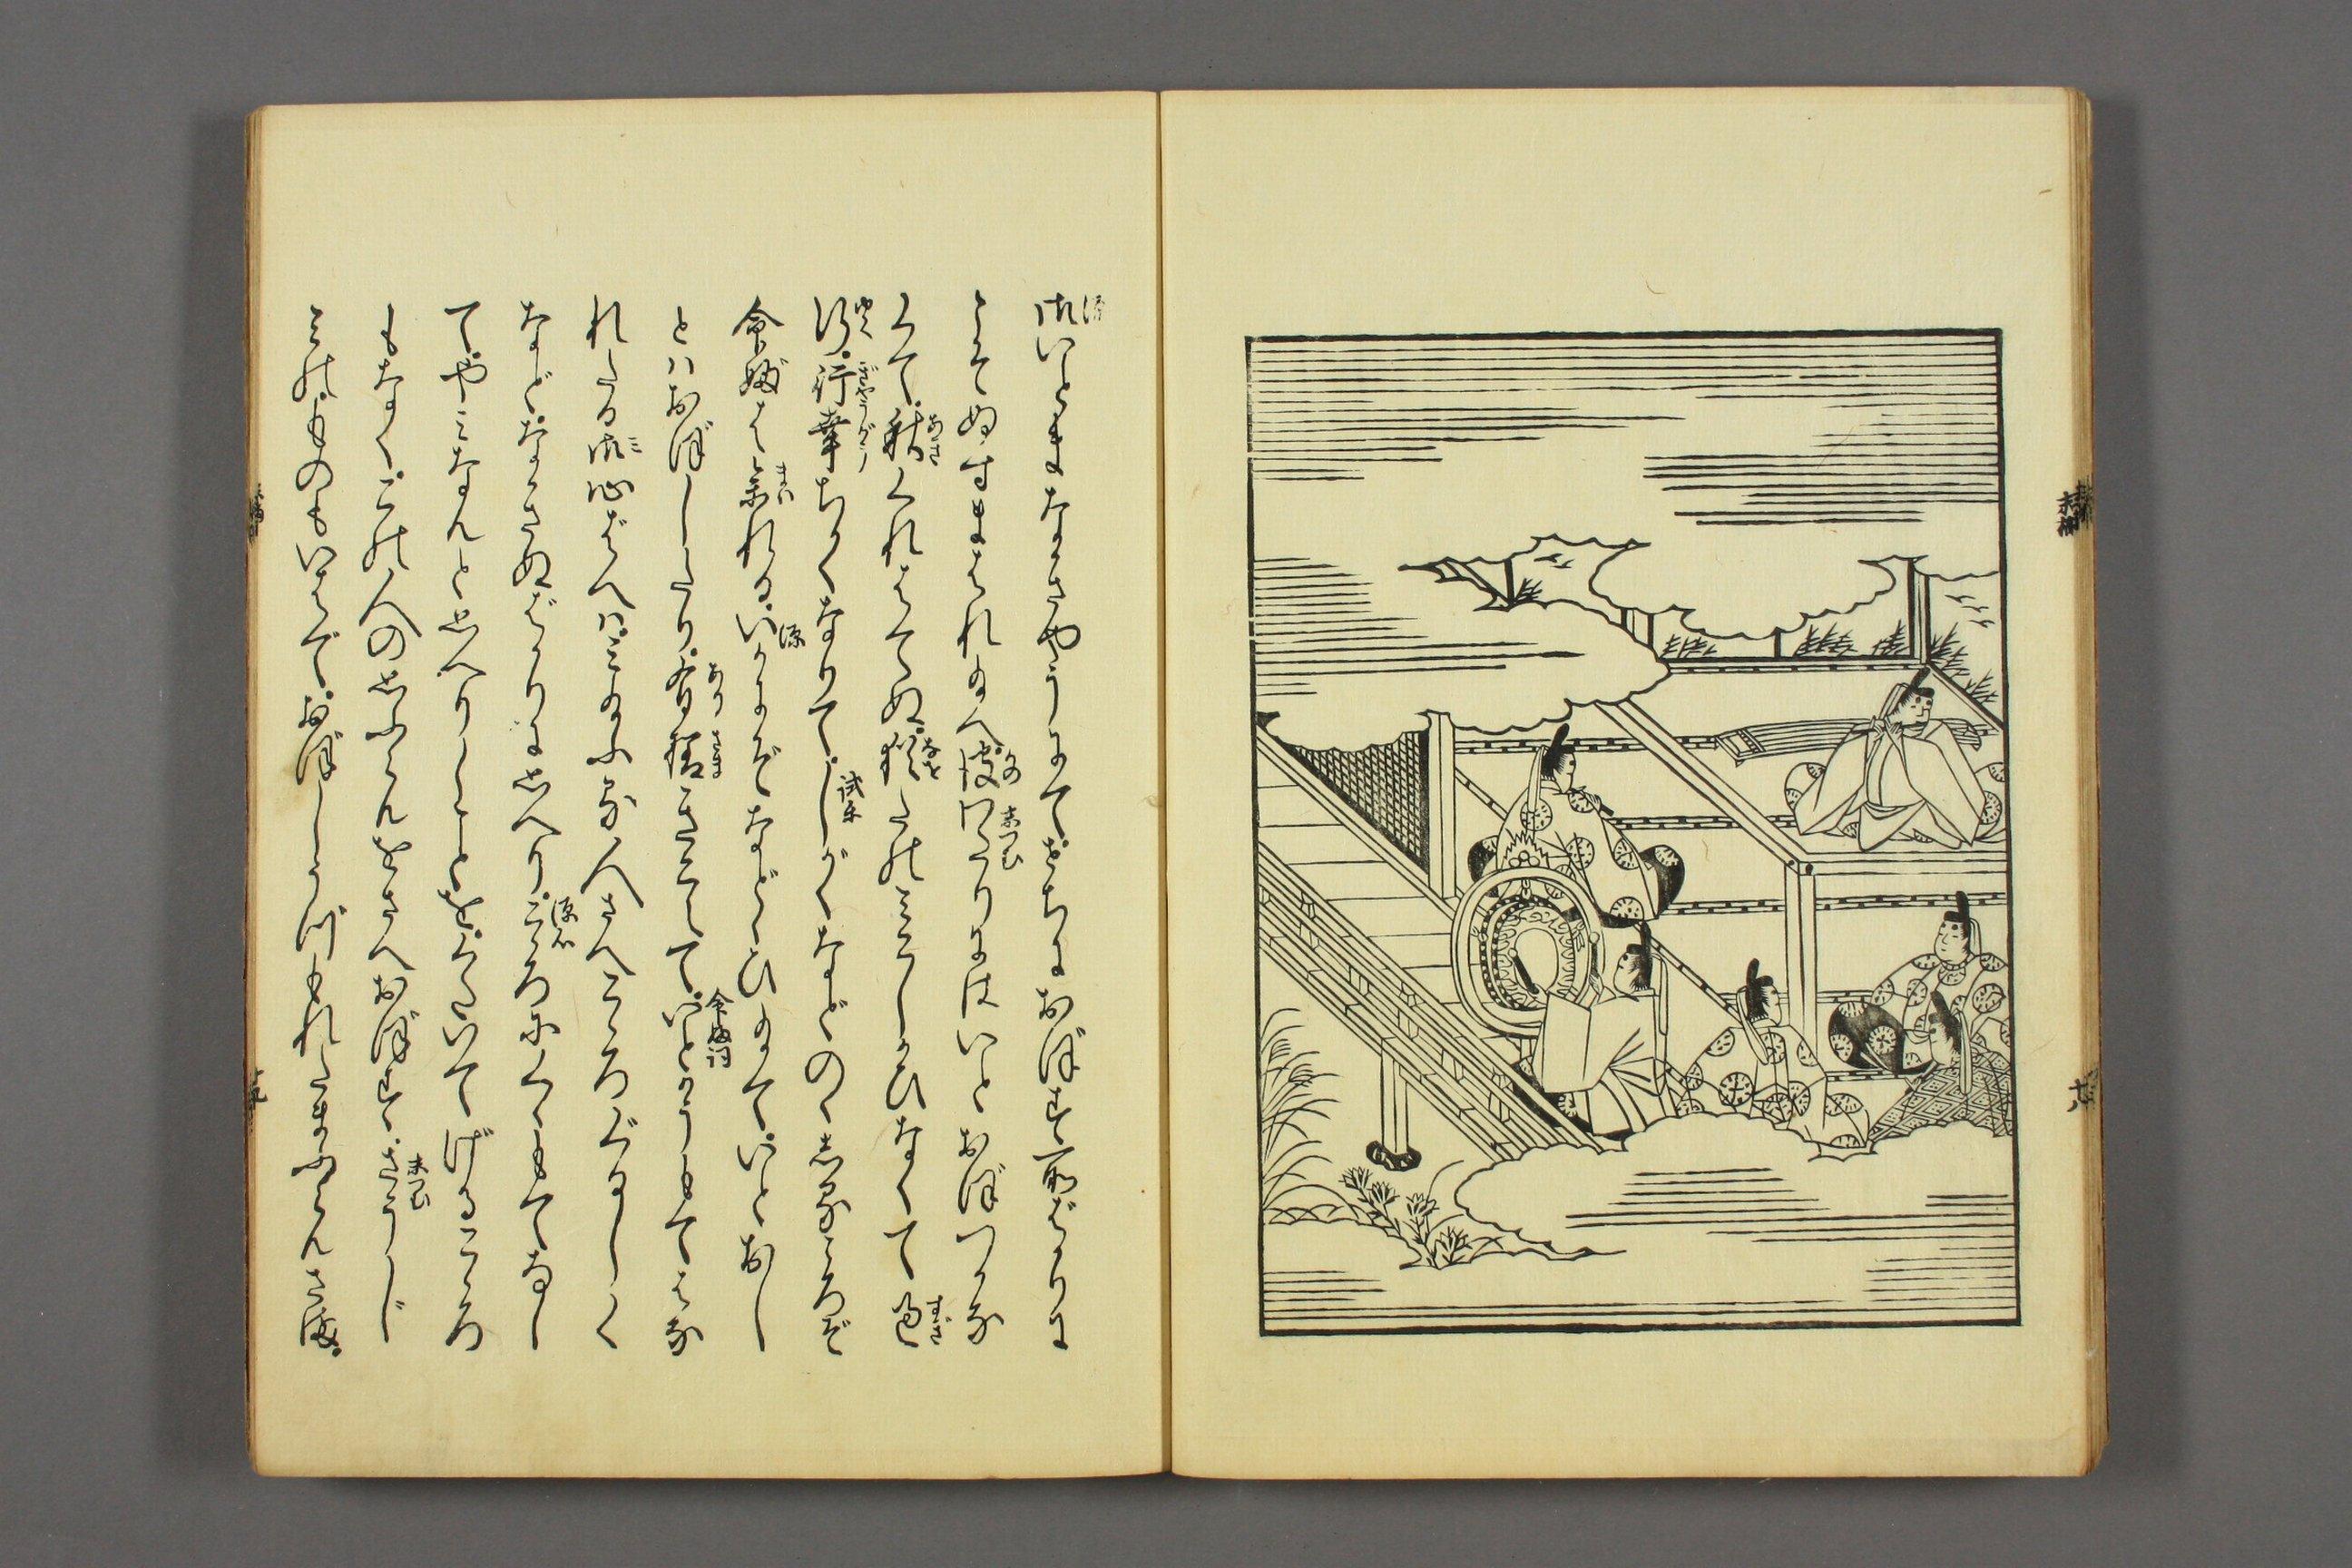 http://archive.wul.waseda.ac.jp/kosho/bunko30/bunko30_a0007/bunko30_a0007_0006/bunko30_a0007_0006_p0020.jpg